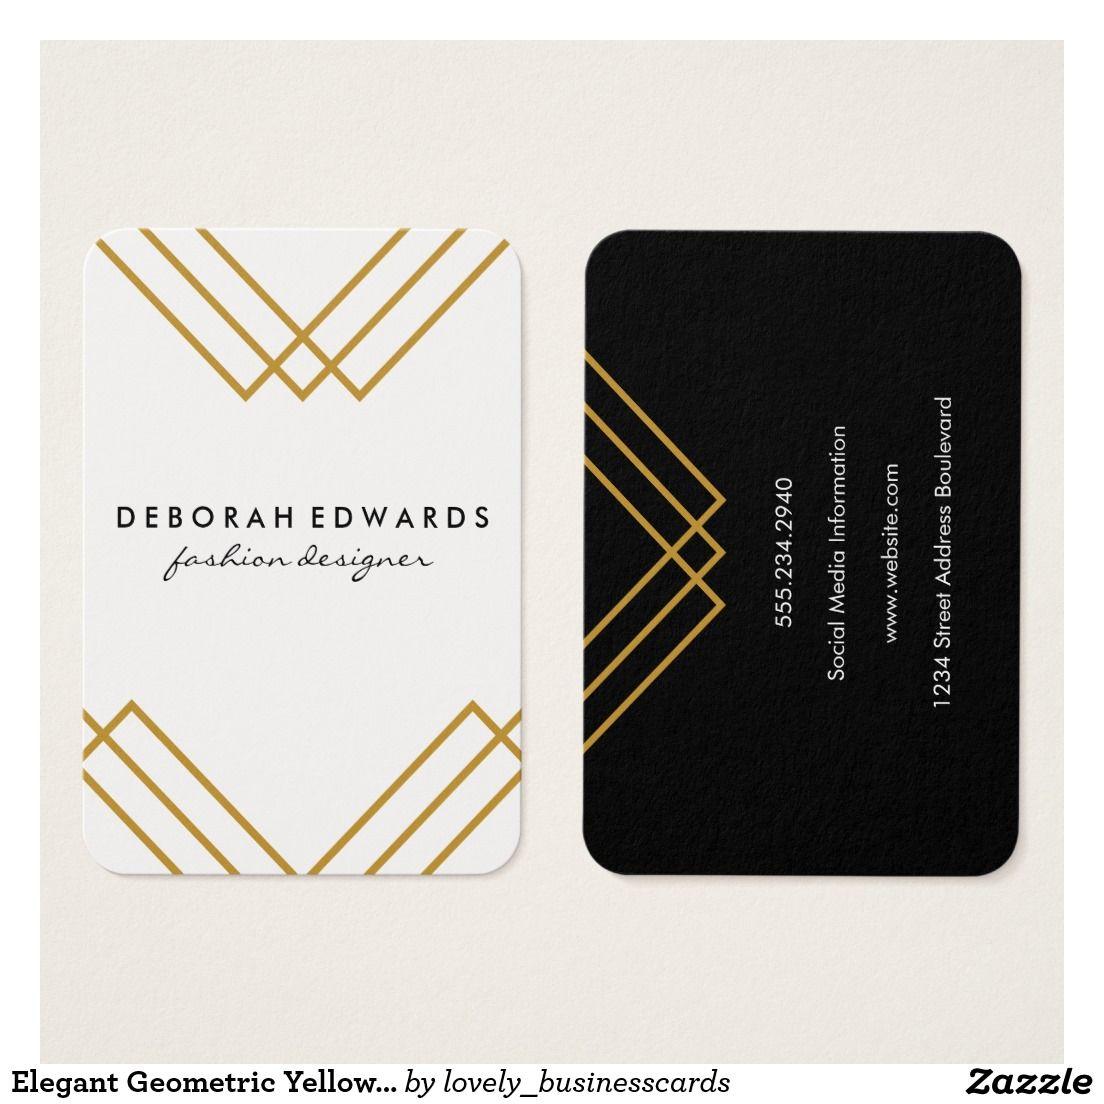 Elegant geometric yellow with gold lines business card business elegant geometric yellow with gold lines business card geometric eventplanner minimalist lifestyleblogger reheart Gallery